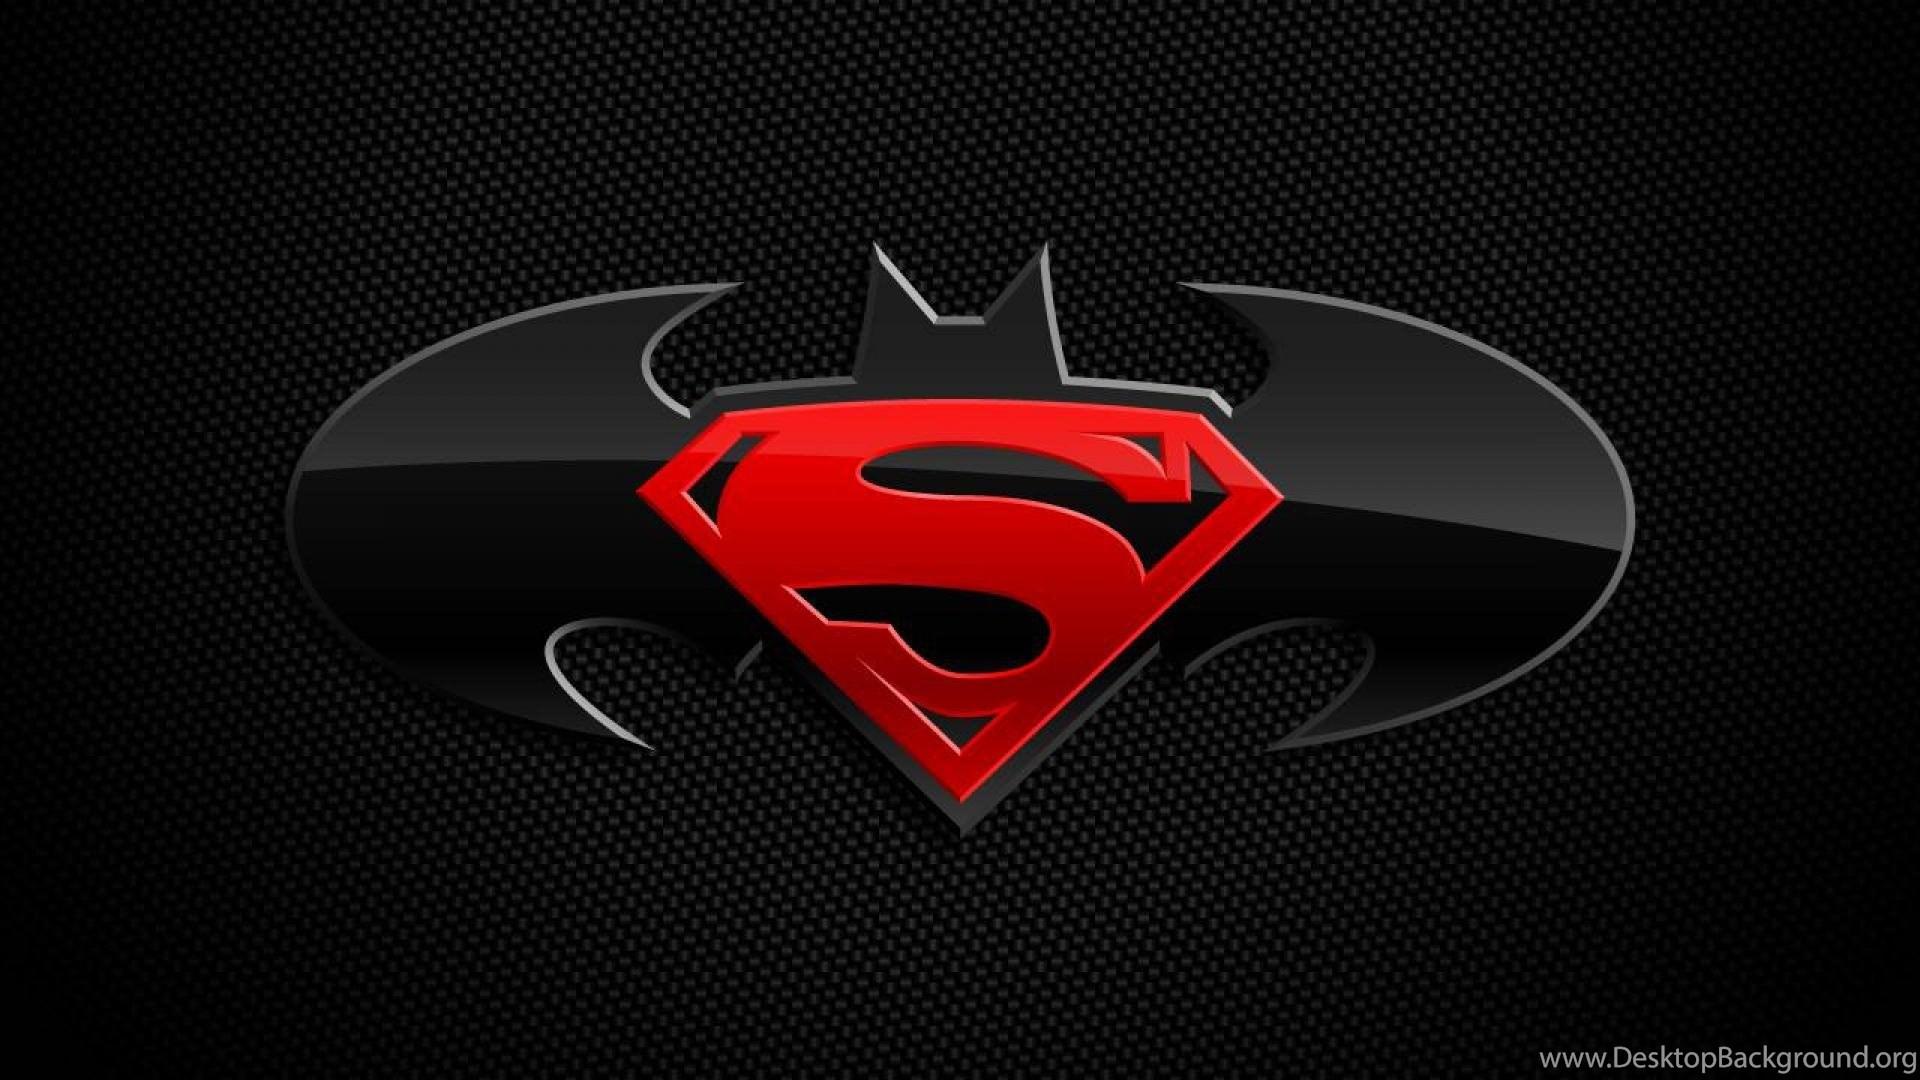 Batman Logo Dc Comics Superman Wallpapers Desktop Background